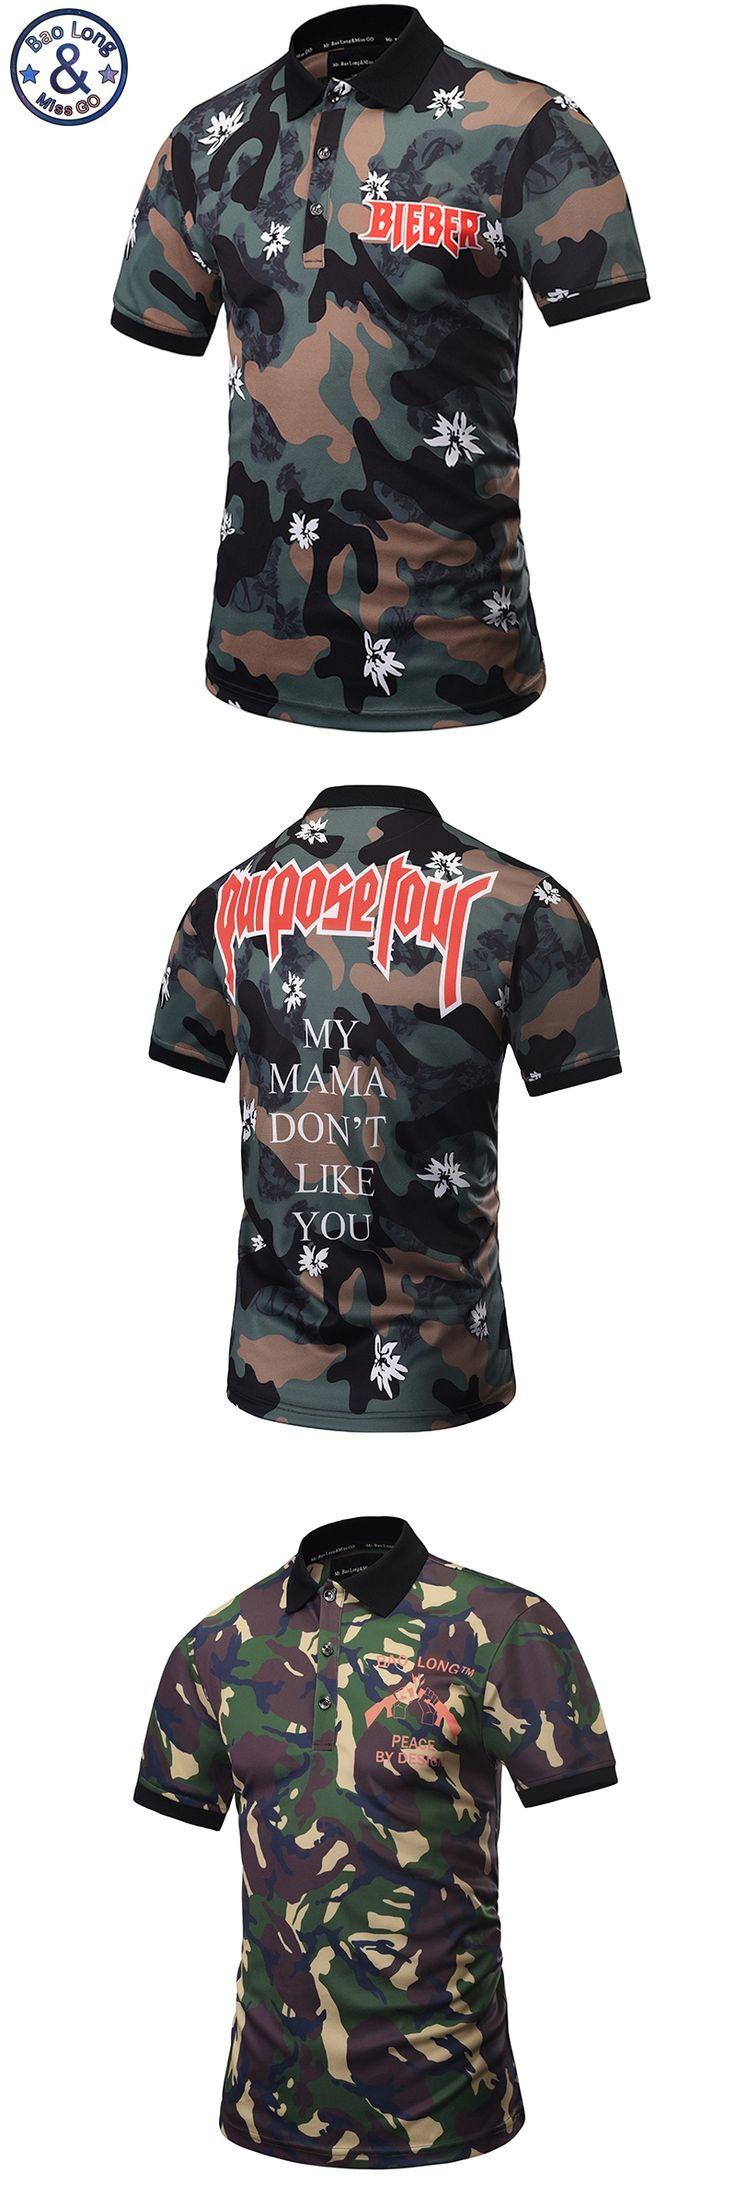 2017 Europe America Hot Men POLO Shirt Camouflage Guns Logo 3D Shirt 3 Button Men Casual Polo shirts M-3XL 1782-1783